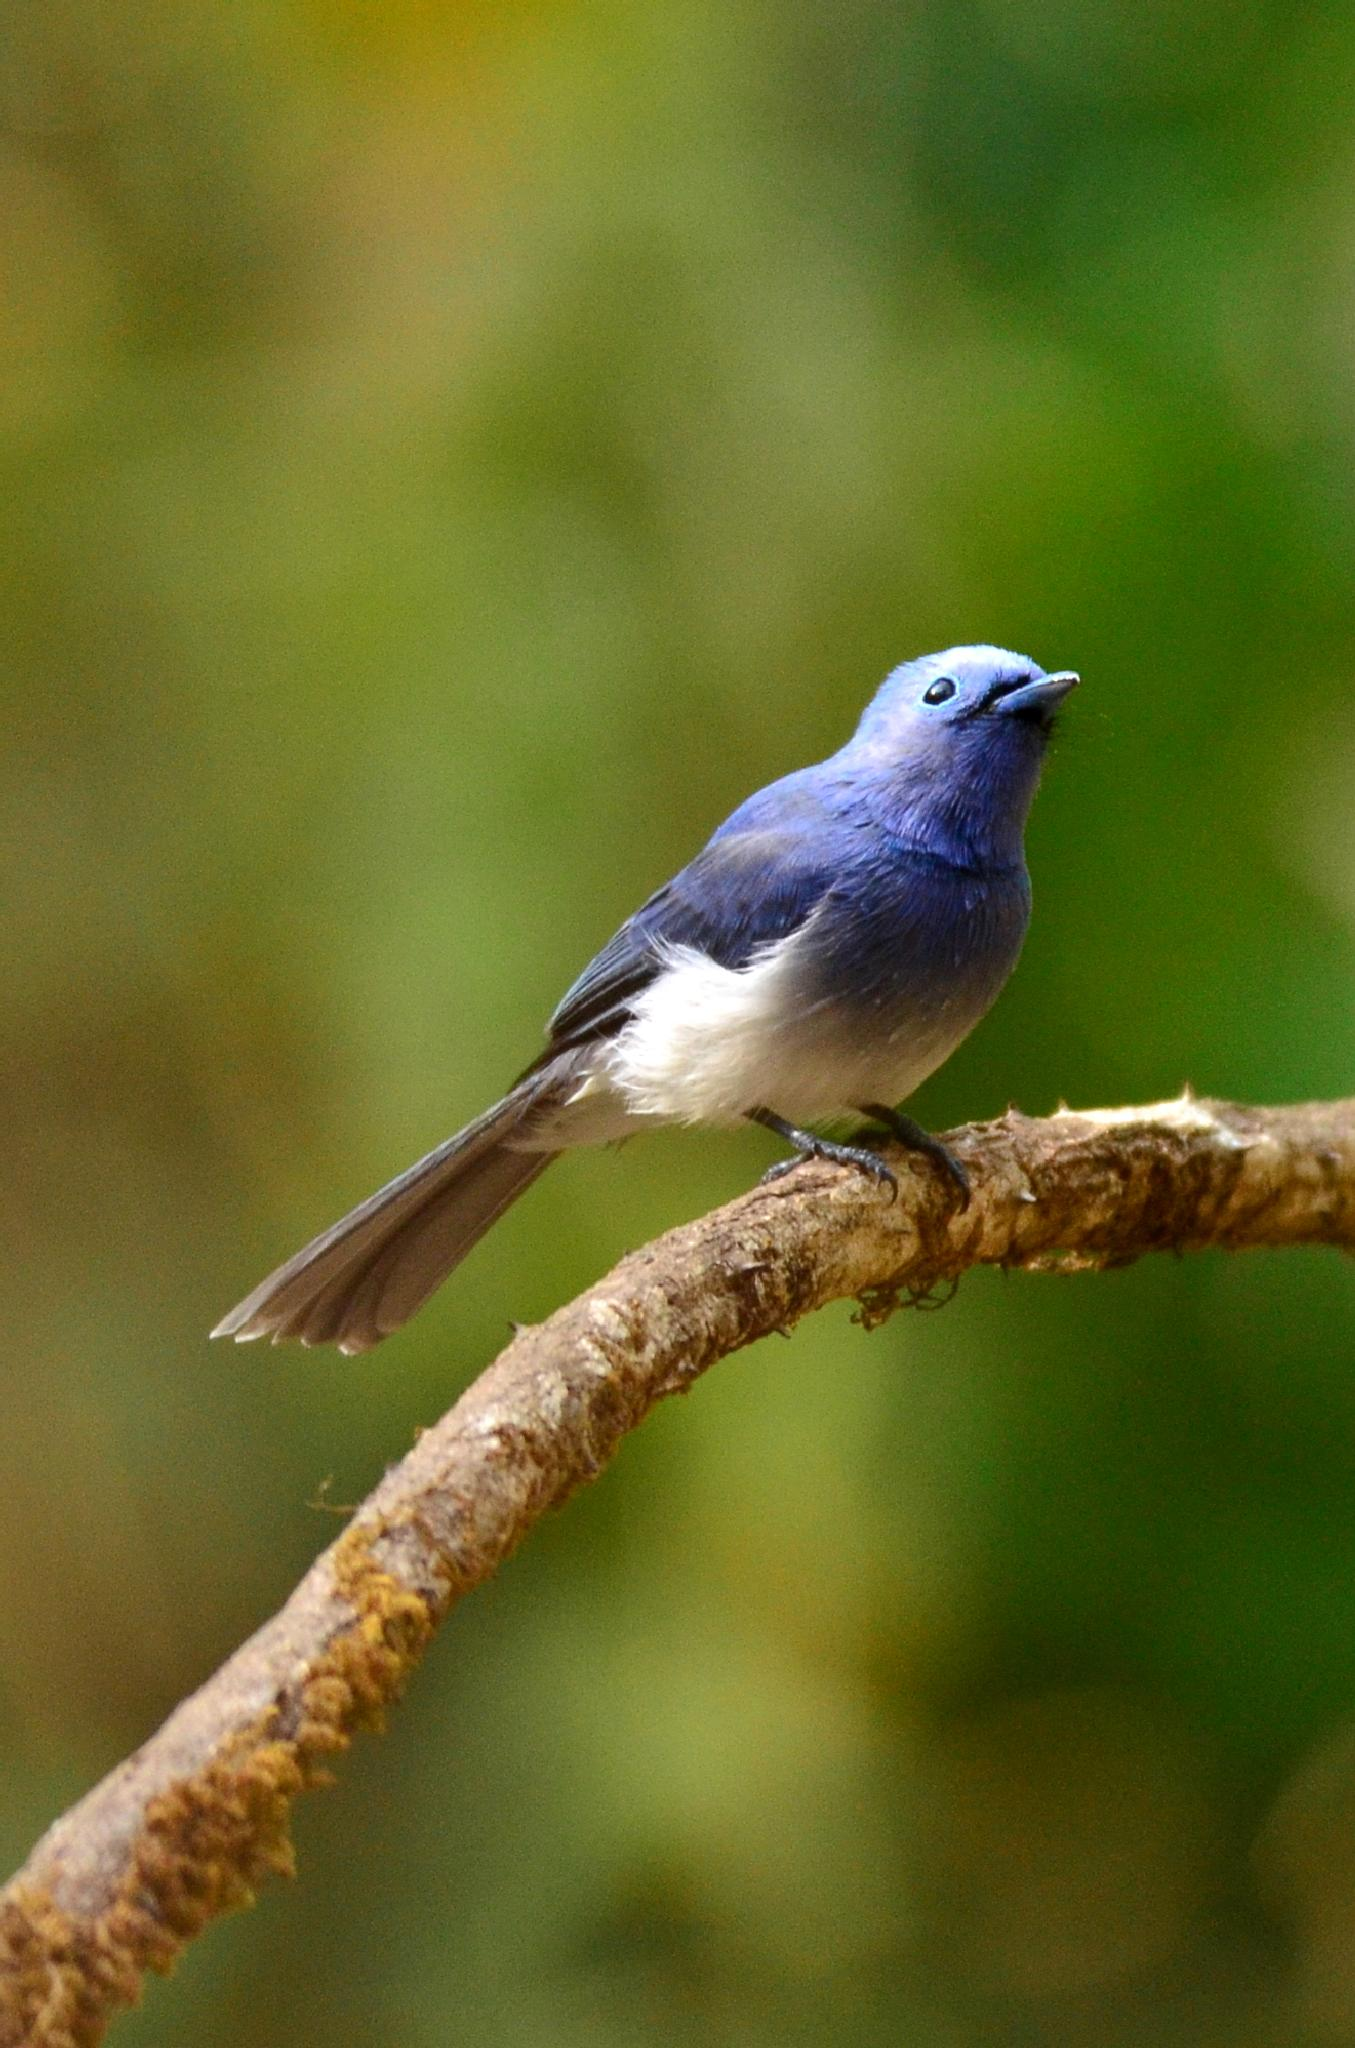 Cutest little bird... by sriramshankars